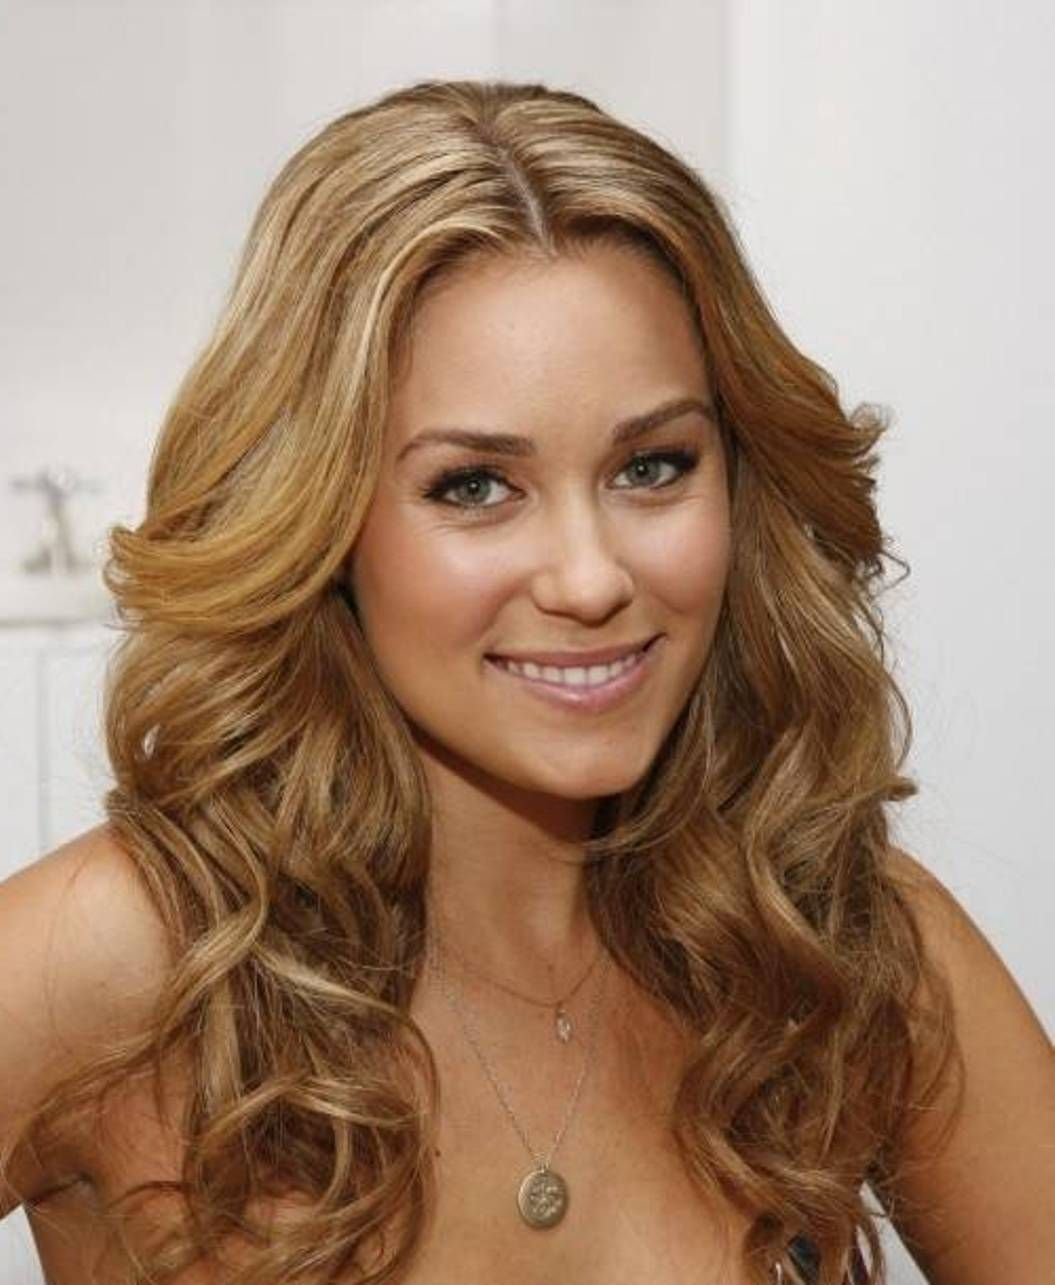 Big Curls Celebrity Lauren Conrad Hairstyles Big Curls